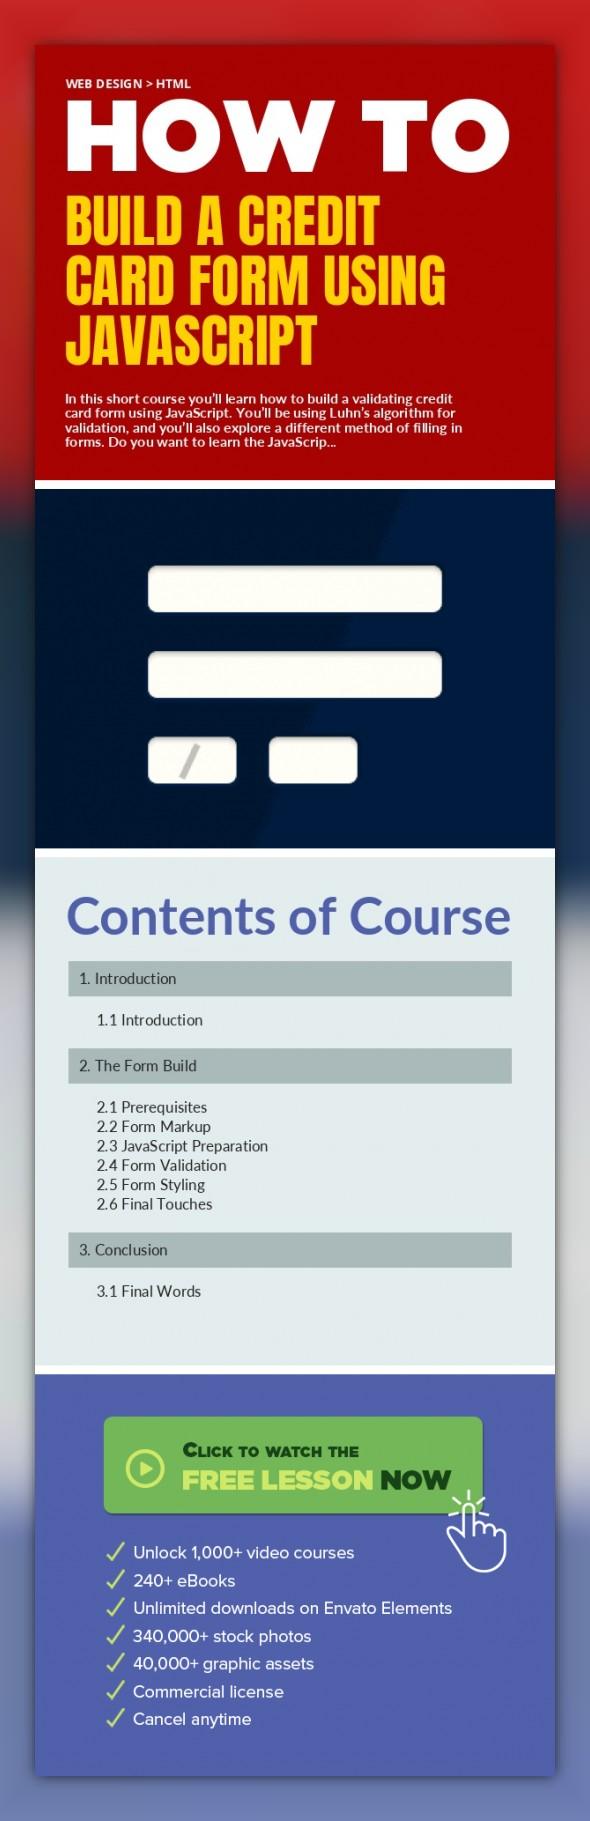 Build A Credit Card Form Using Javascript Web Design Html Web